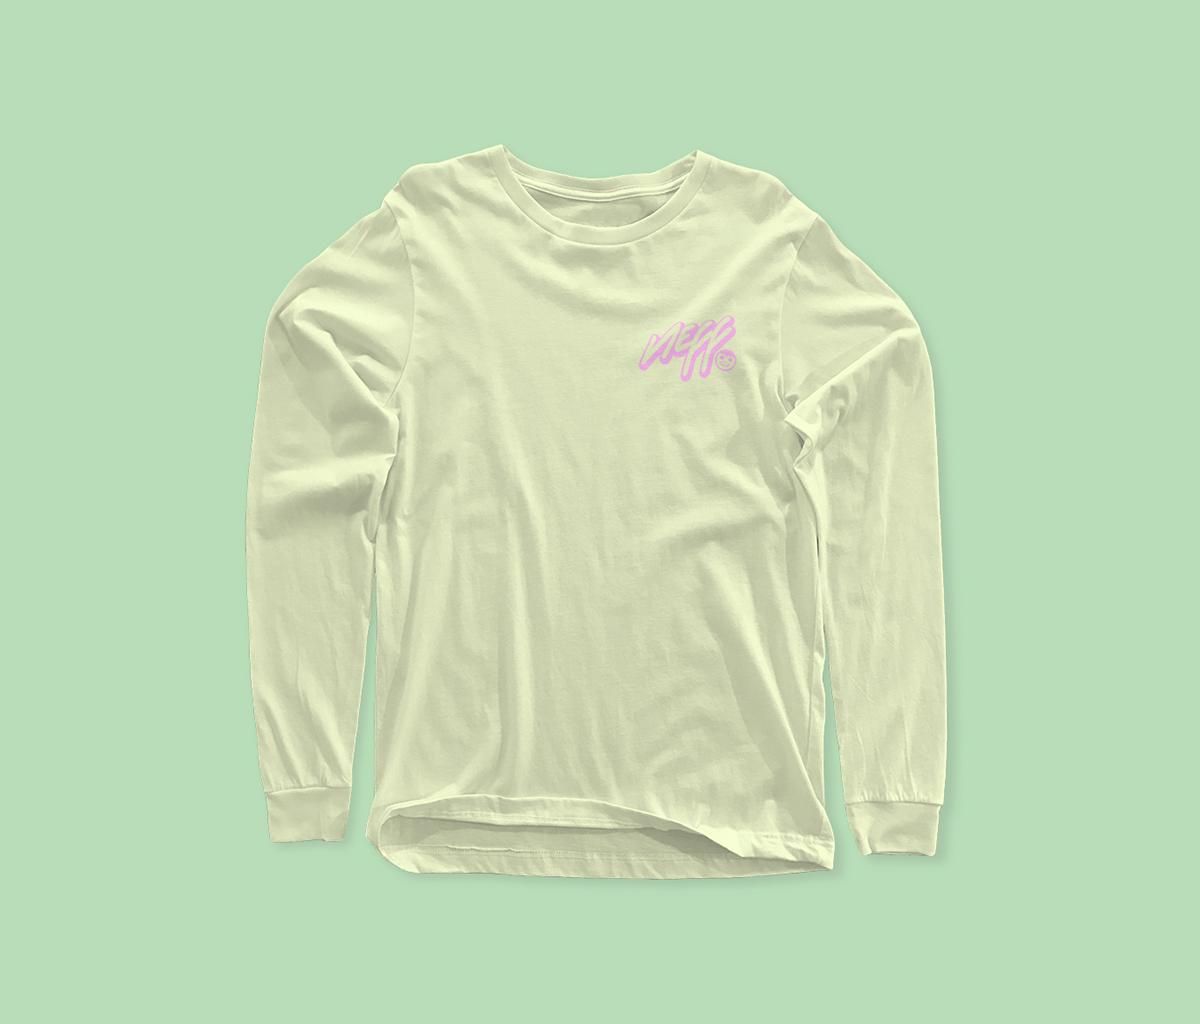 free long sleeve t shirt mockup on behance